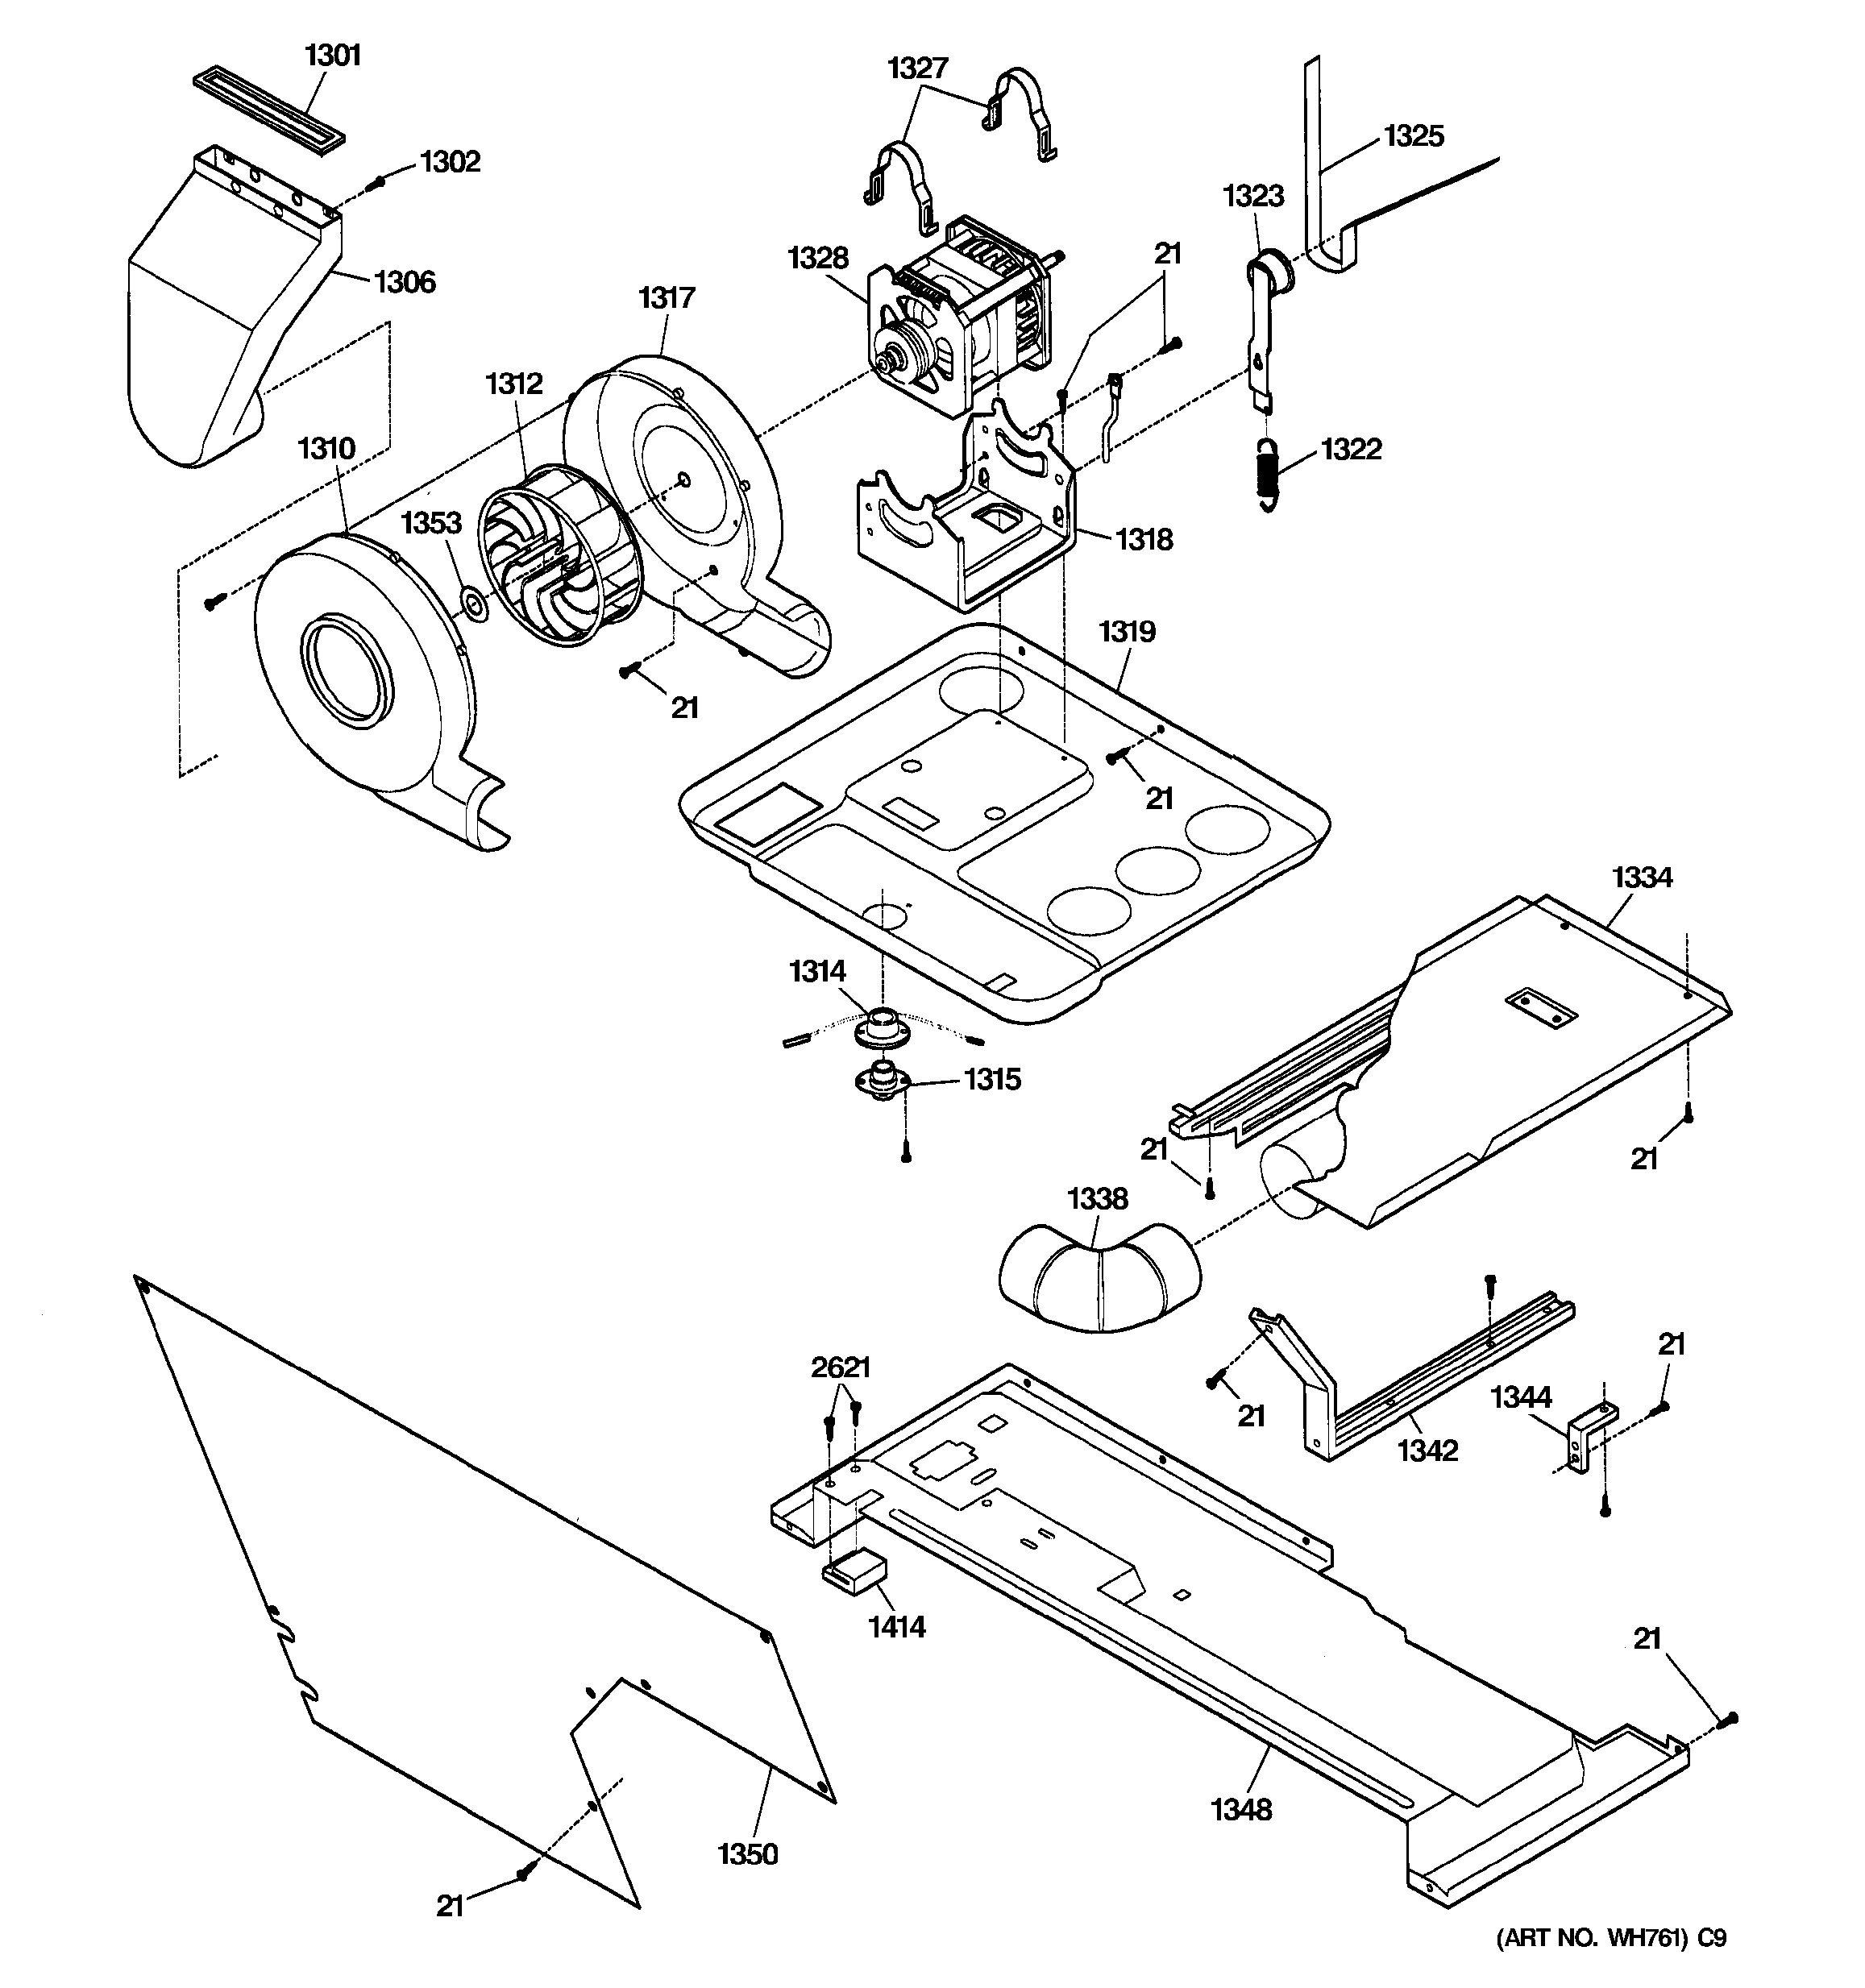 Assembly View For Dryer Motor Blower Amp Belt